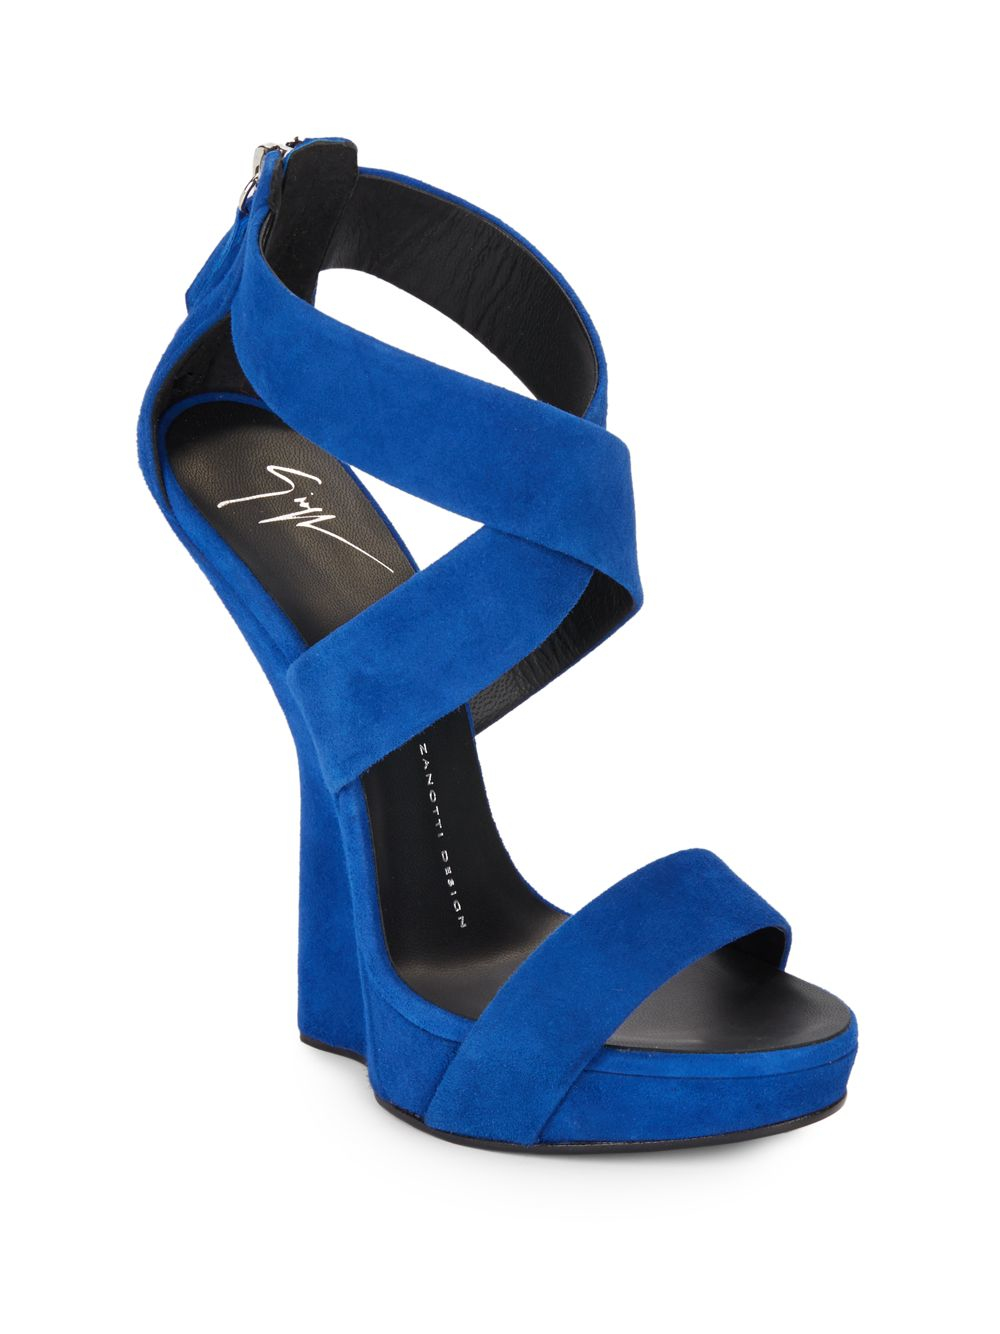 giuseppe zanotti blue suede shoes